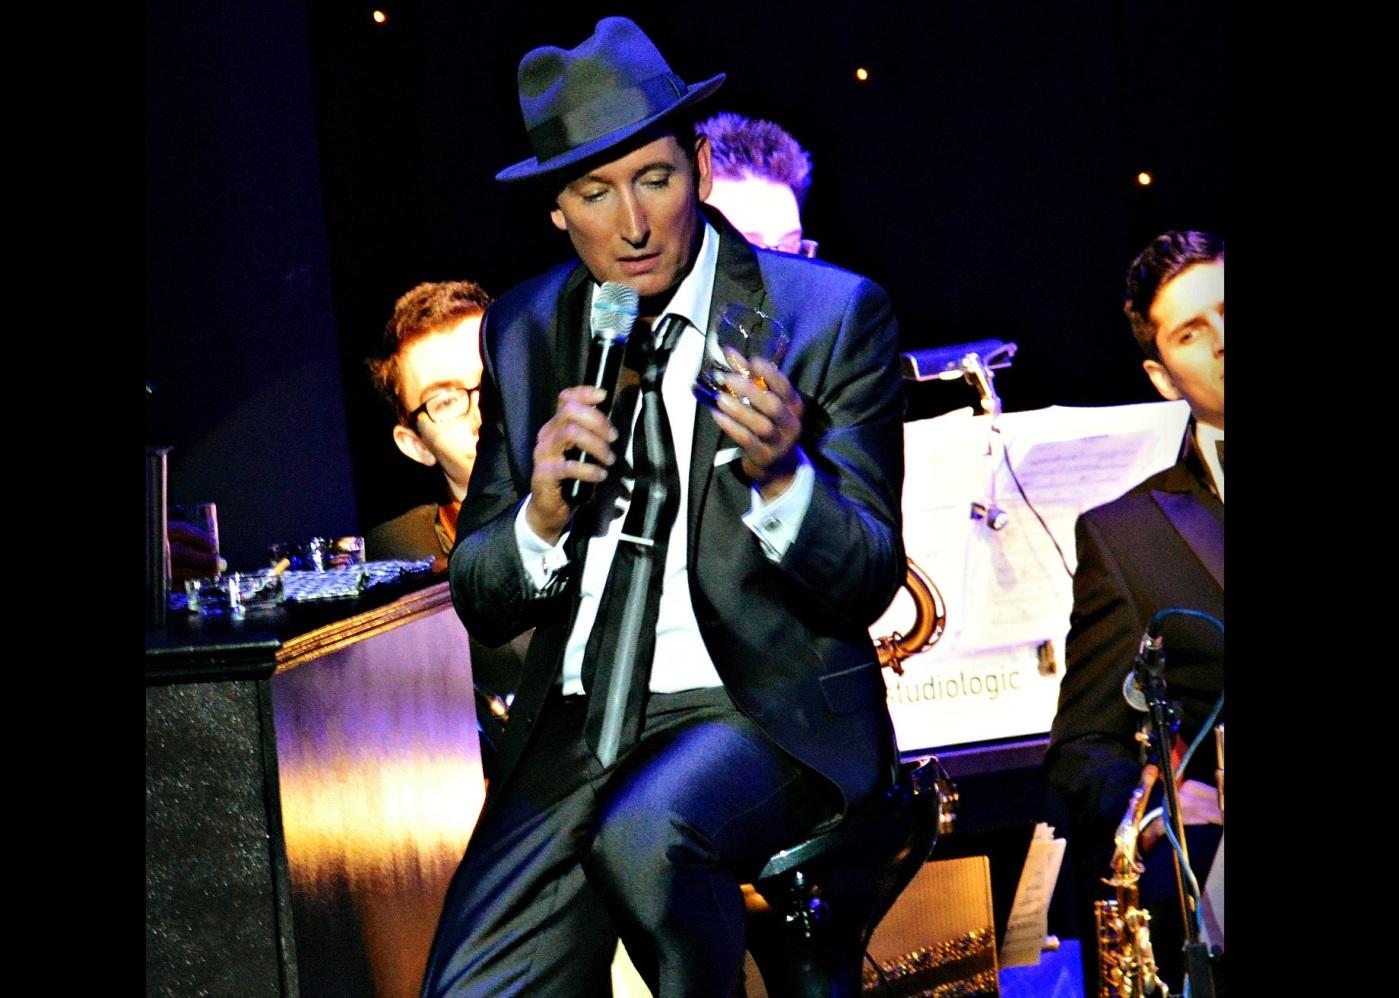 Frank Sinatra look alike soundalike